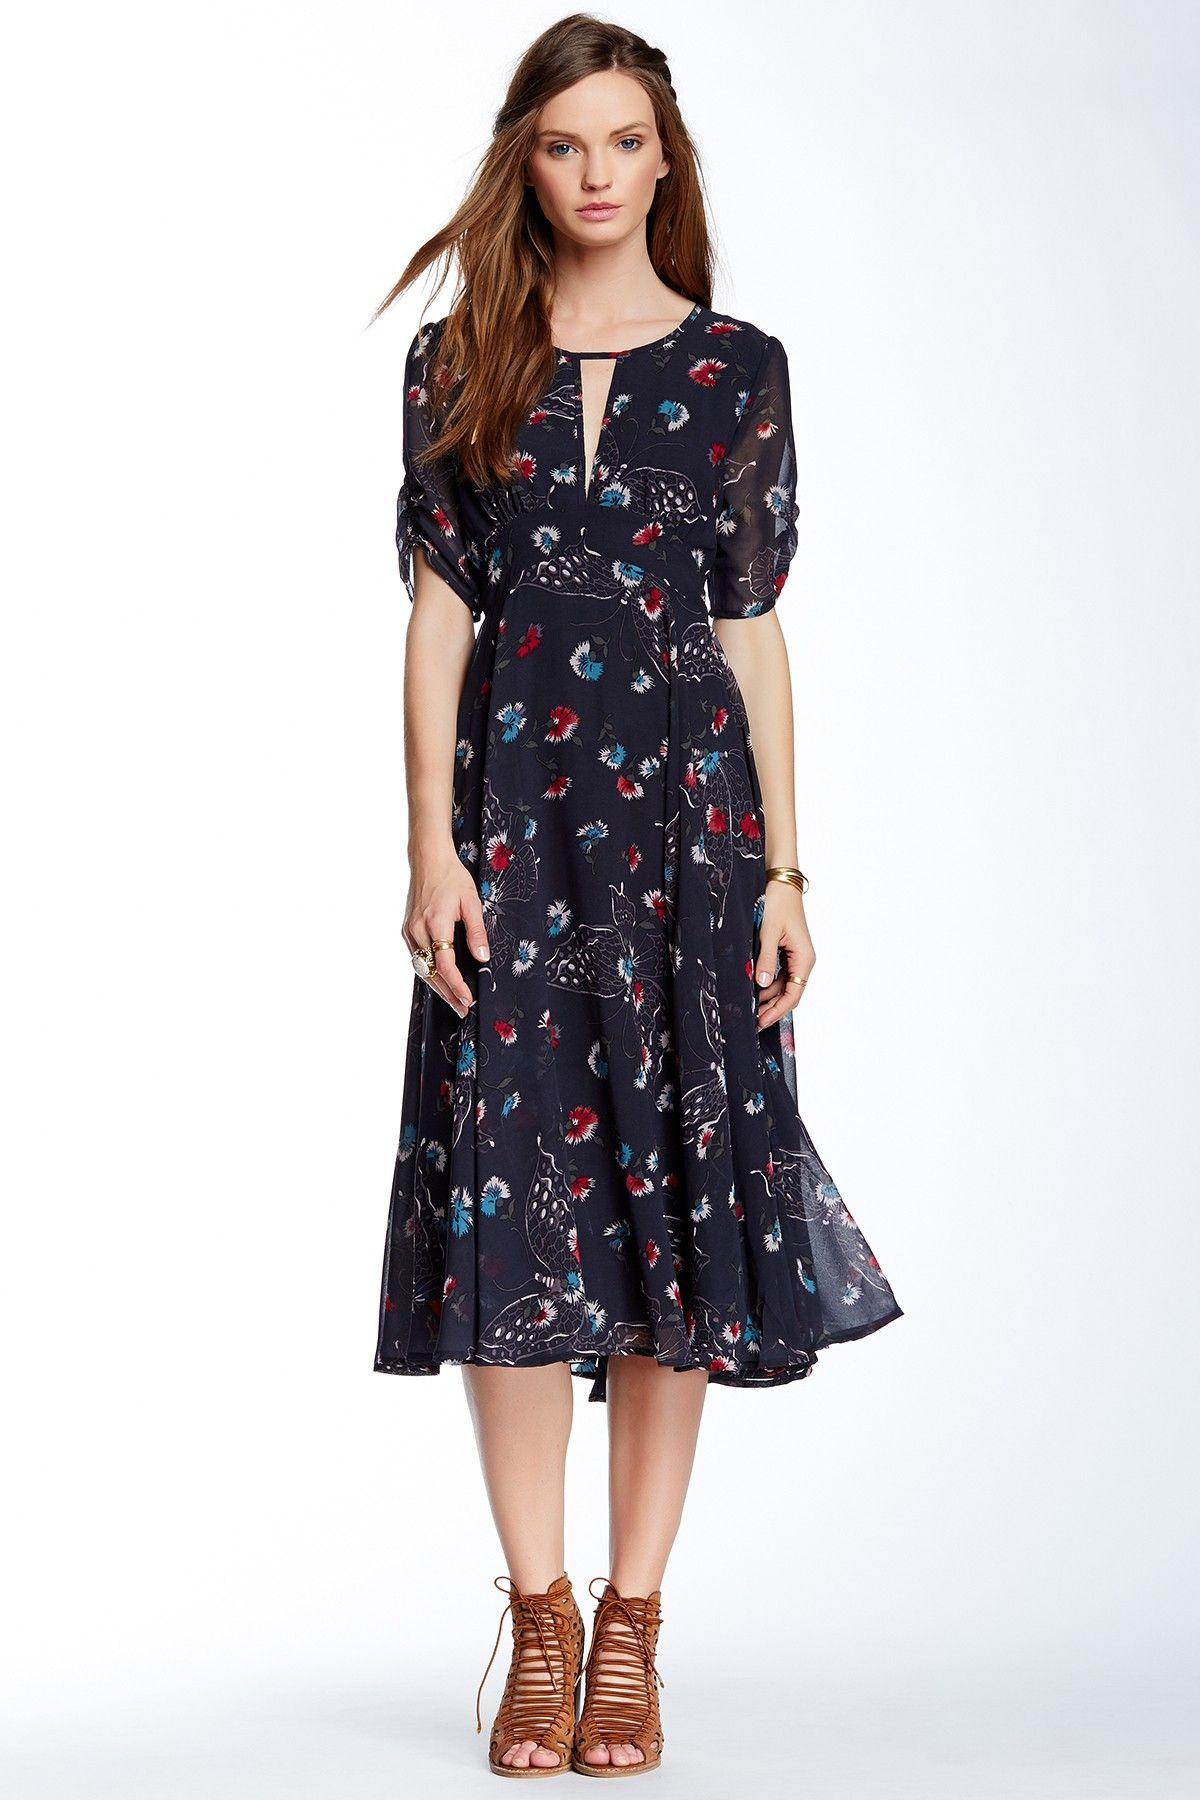 Free People Bonnie Floral Print Dress Floral Print Dress